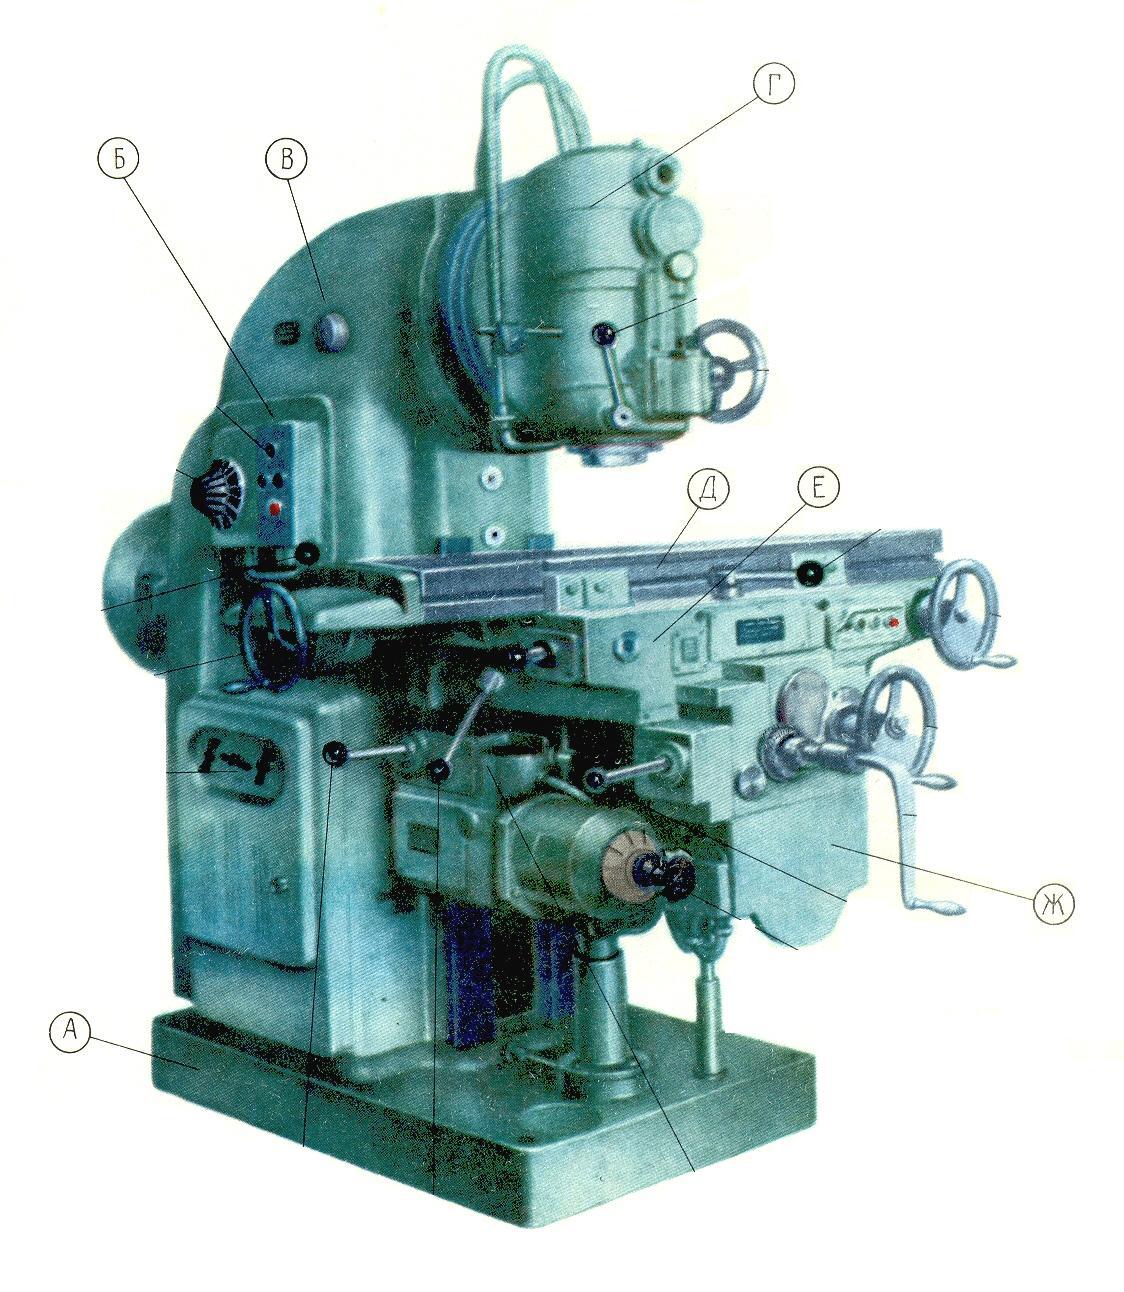 Фрезерный станок по металлу — классификация и характеристики